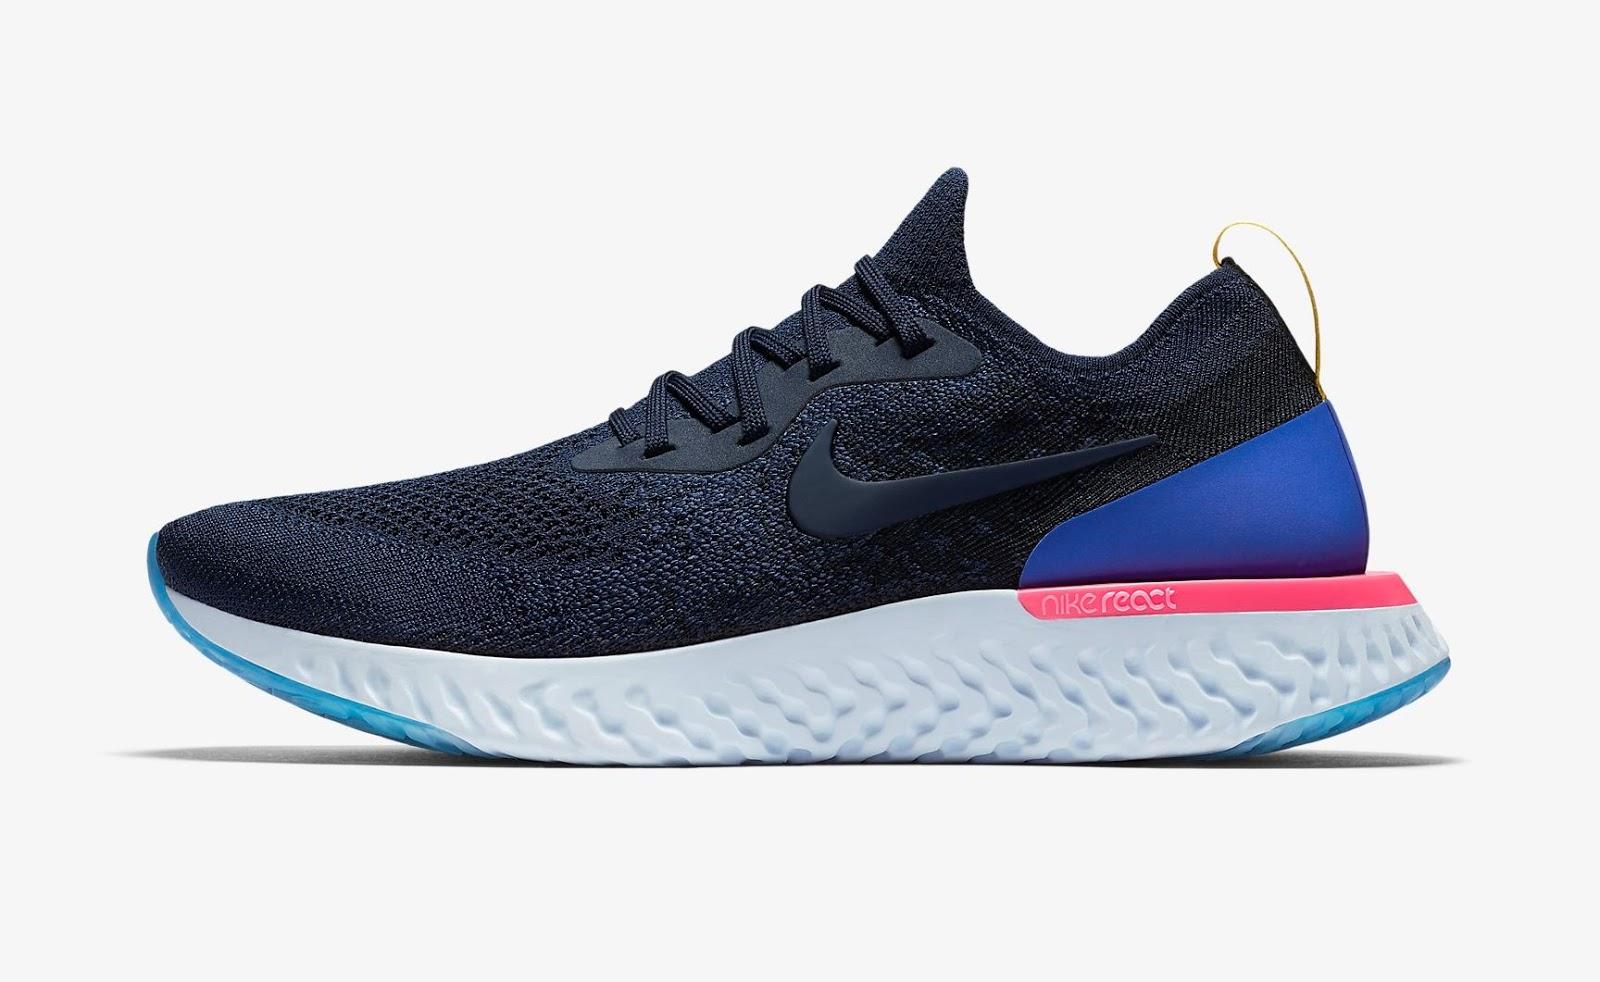 Nike apresenta o Epic React Flyknit, novo tênis para corredores